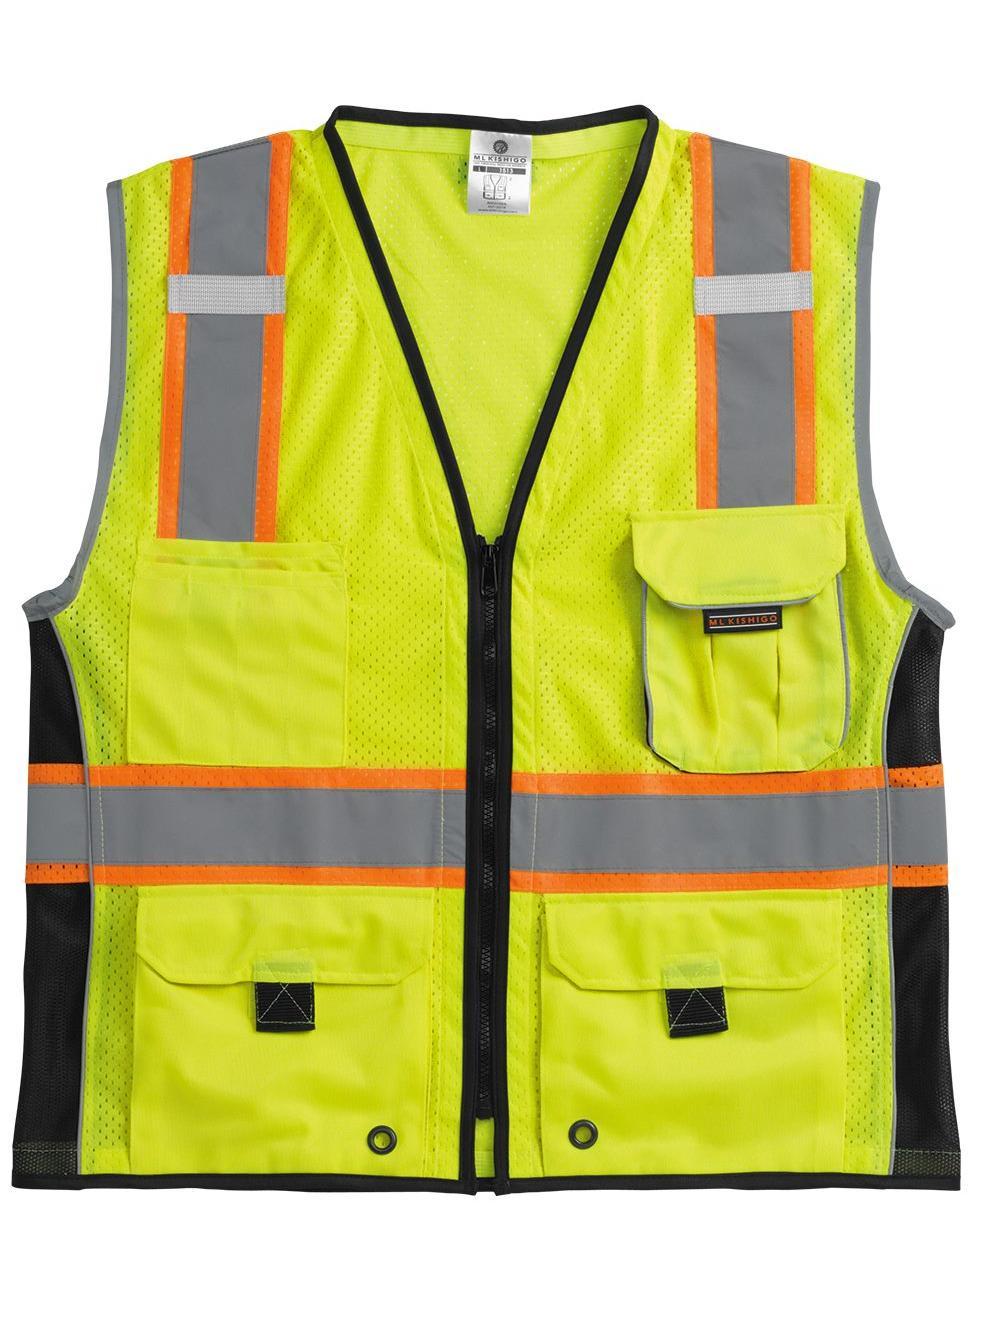 ML Kishigo Black Series Heavy Duty Vest